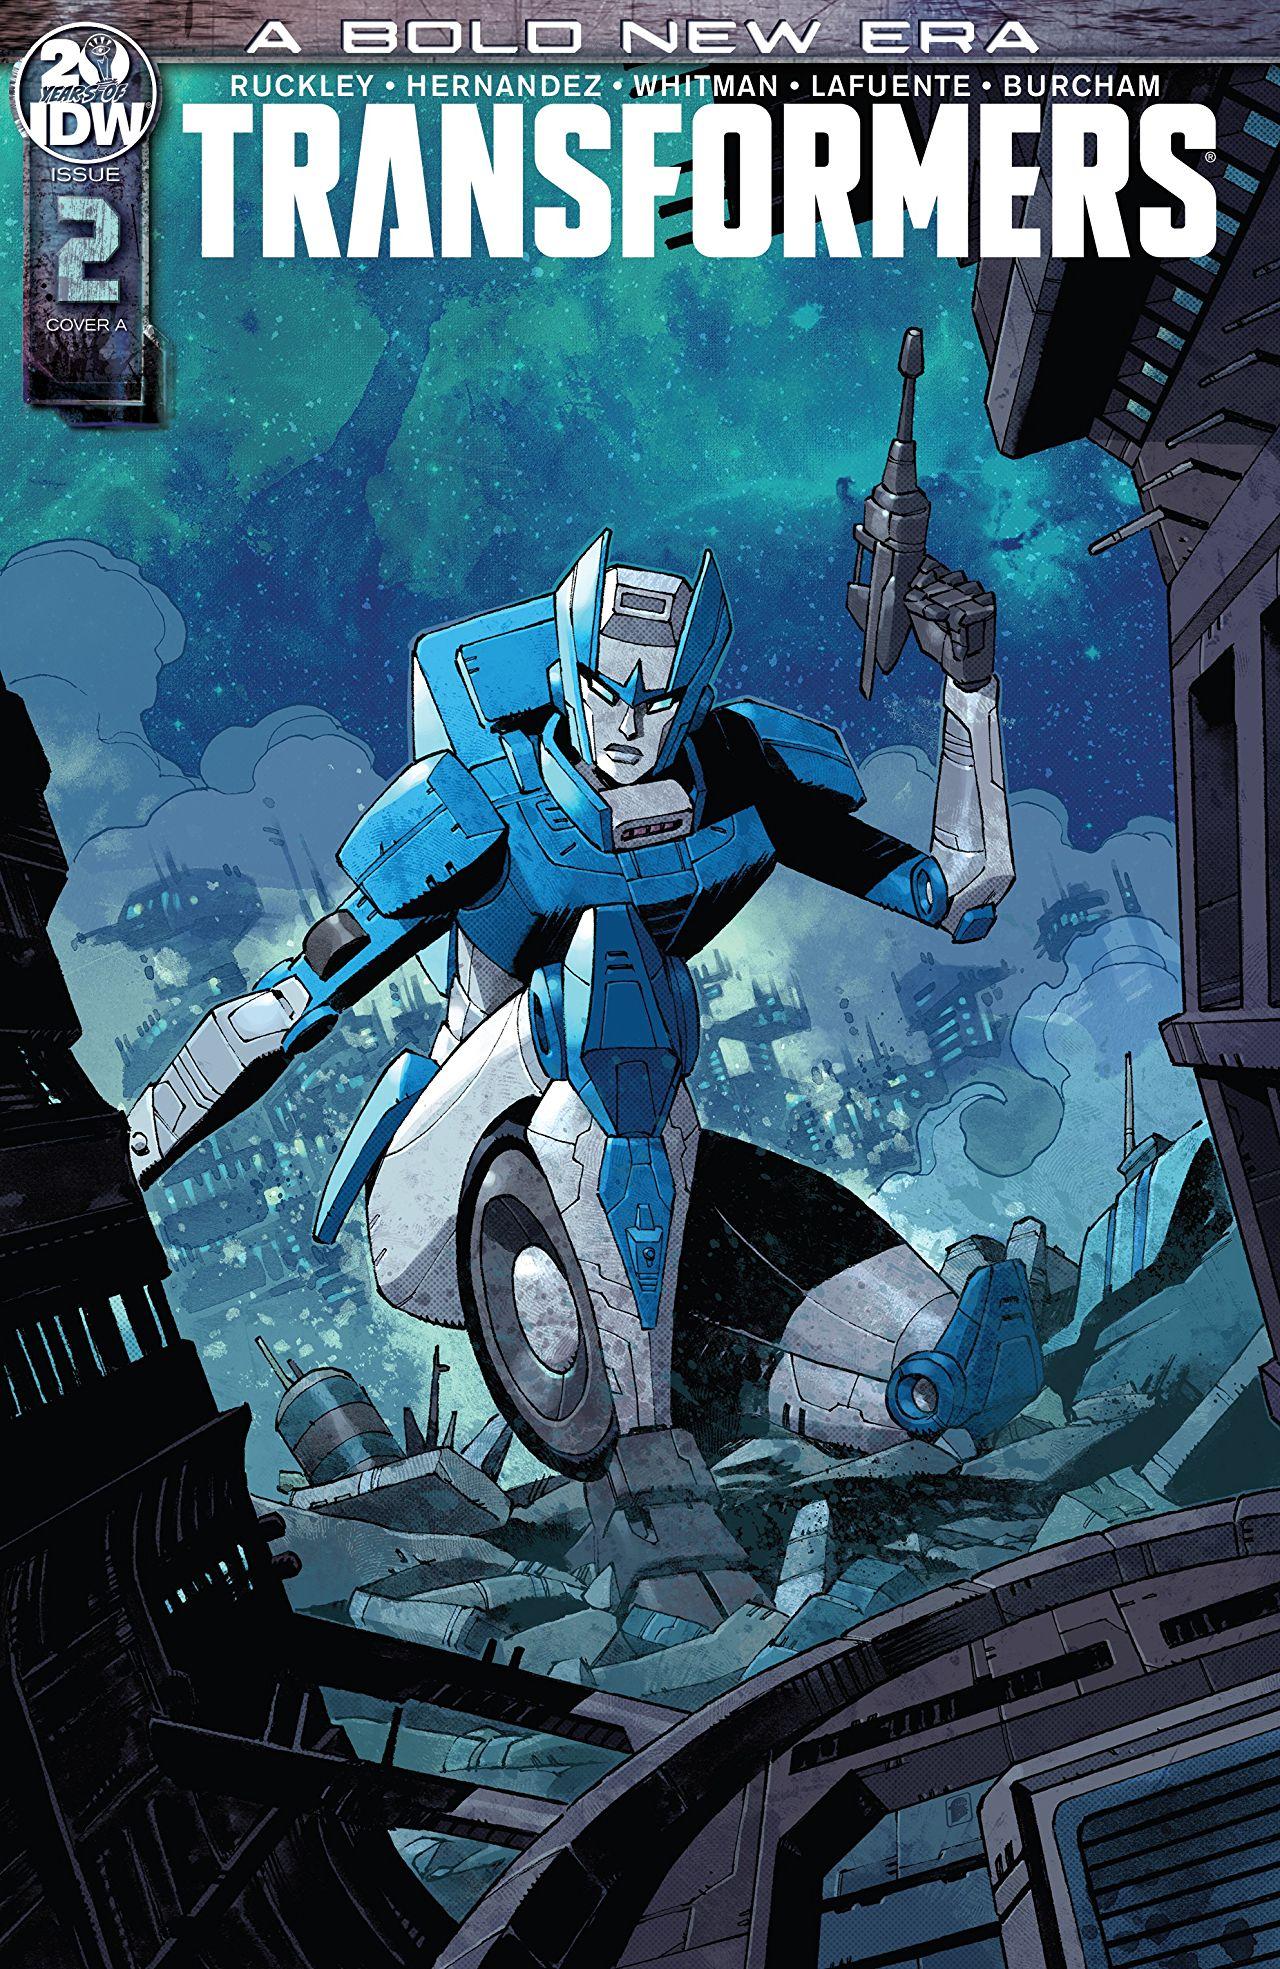 Transformers 2019